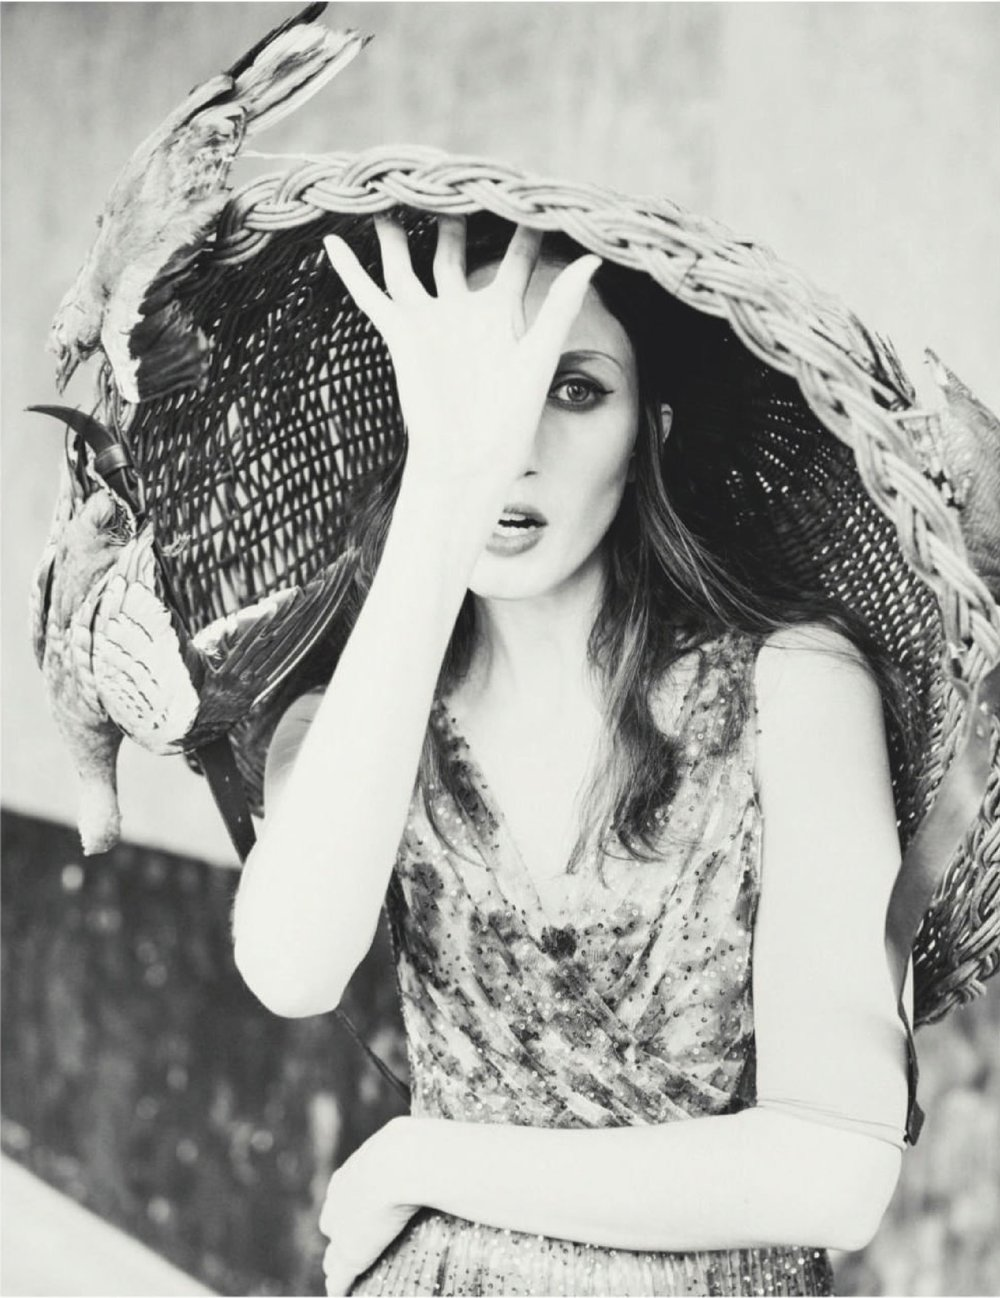 Anna-Cleveland-Guy-Aroch-Elle-Russia-April-2019 (3).jpg